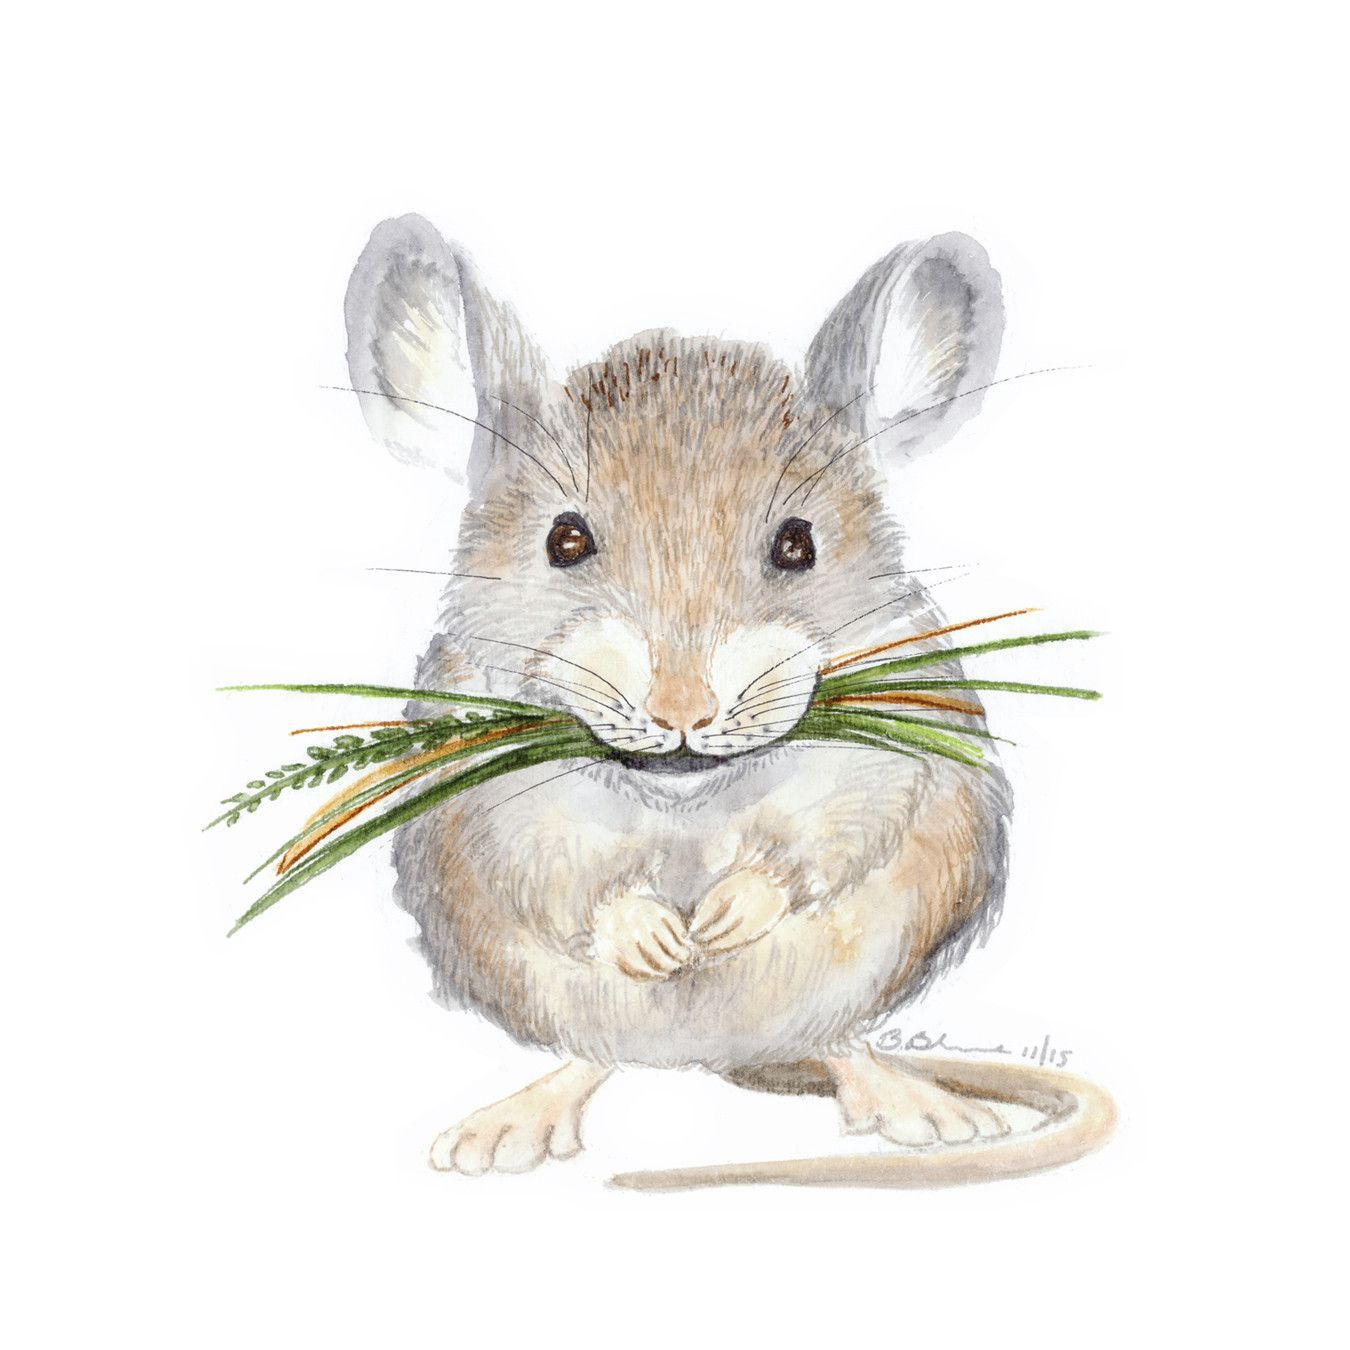 Baby Mouse Portrait Aquarell tiere, Maus malen und Tiere